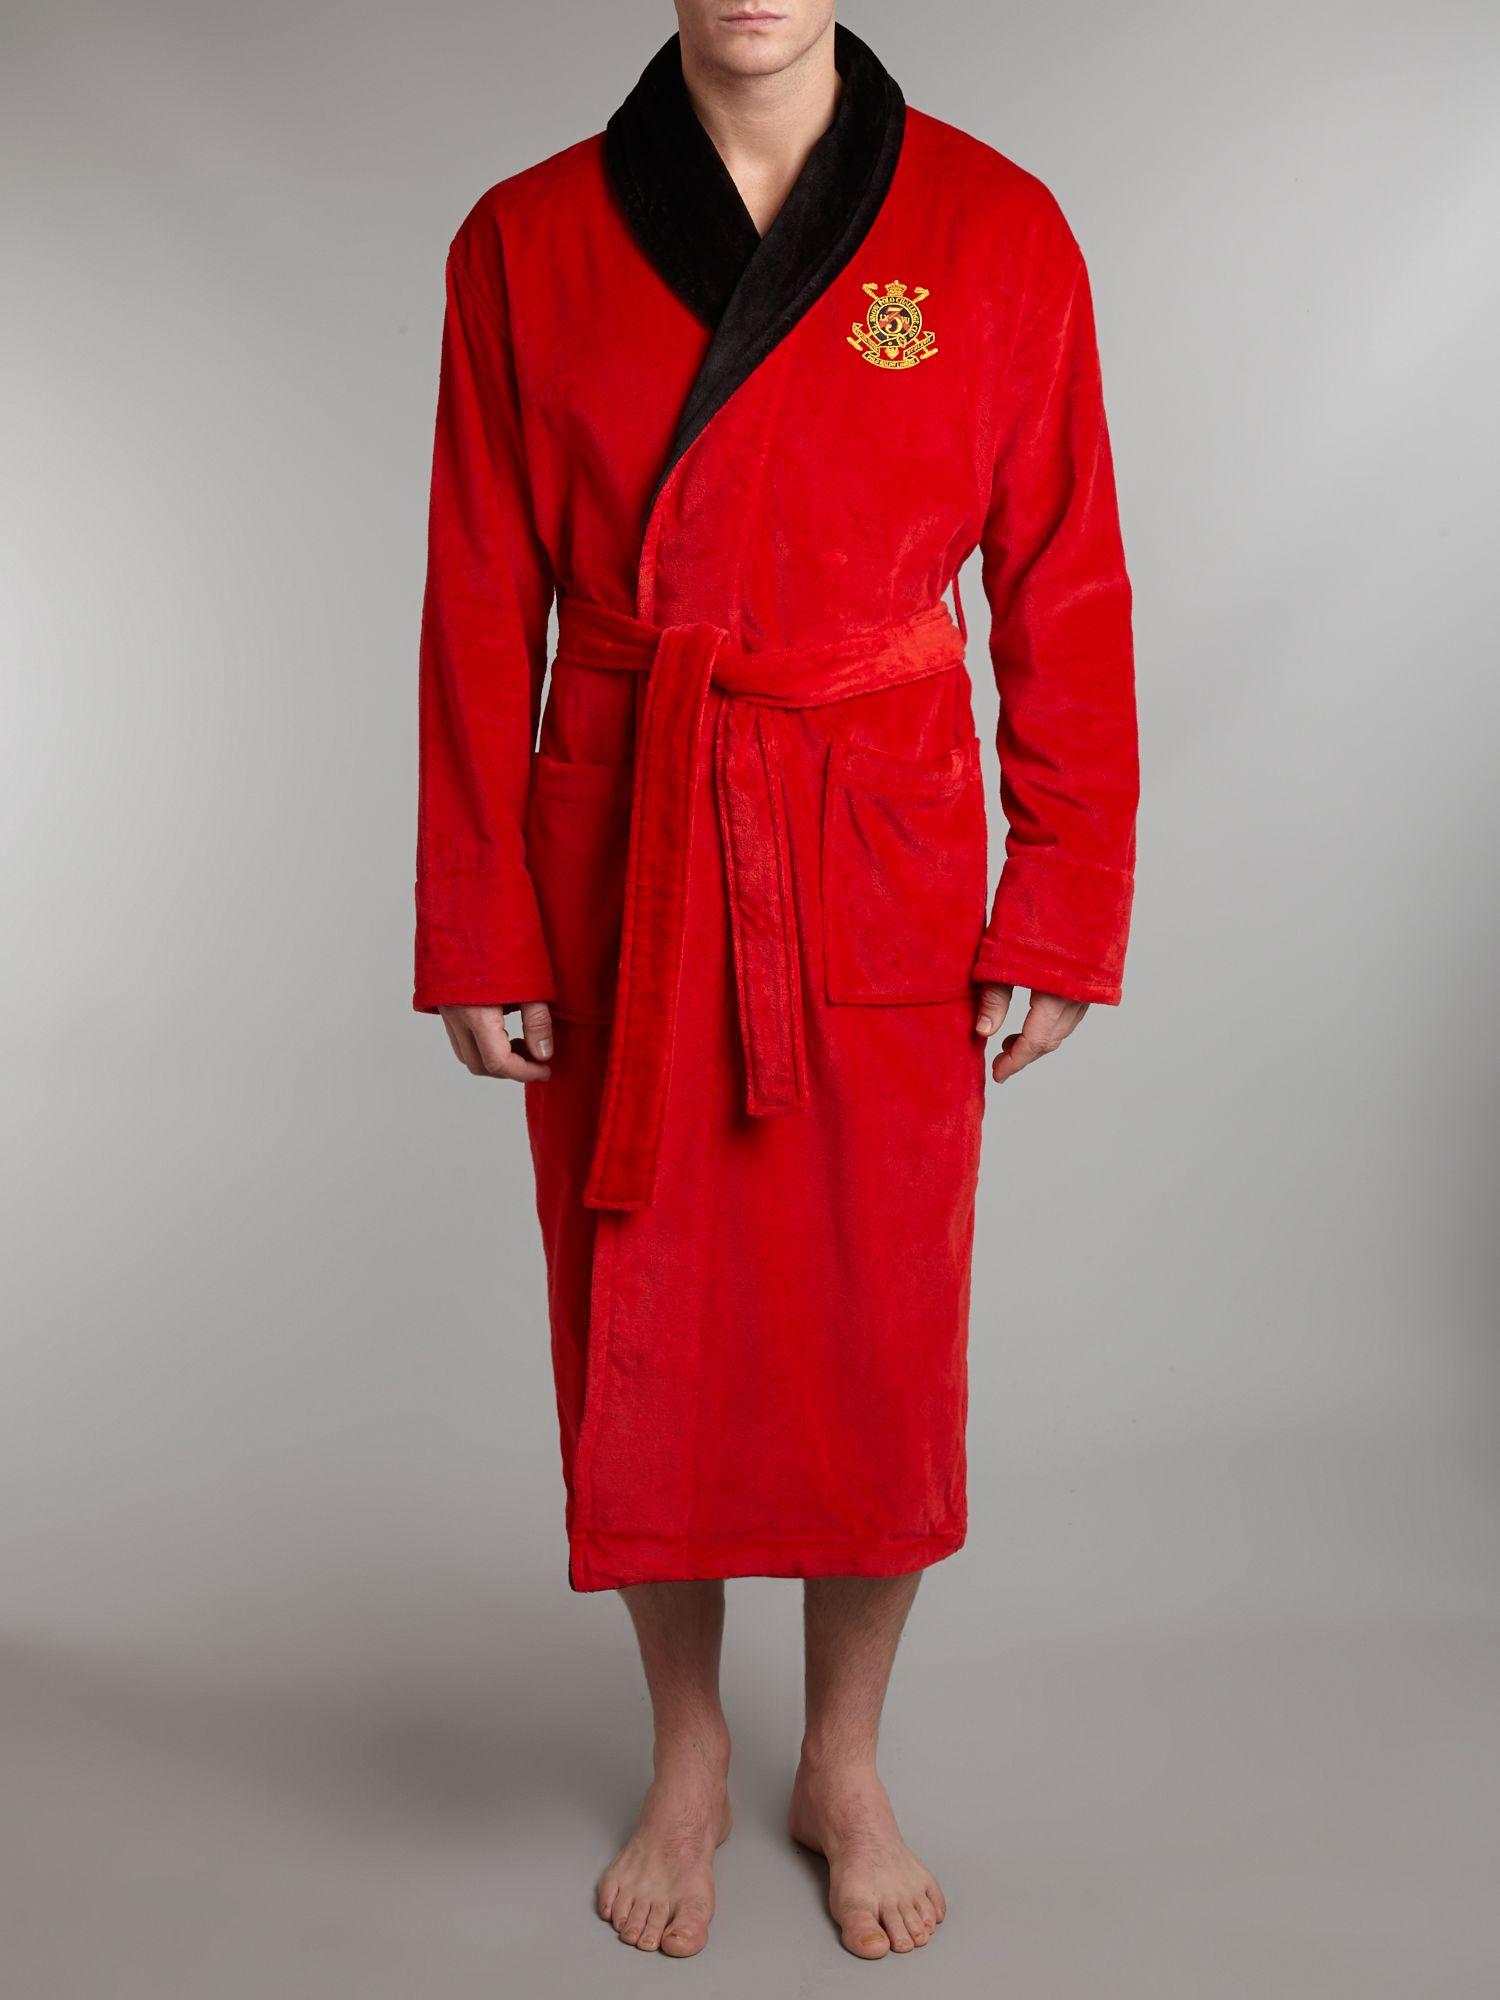 Polo Ralph Lauren Fleece Shawl Collar Robe in Red for Men